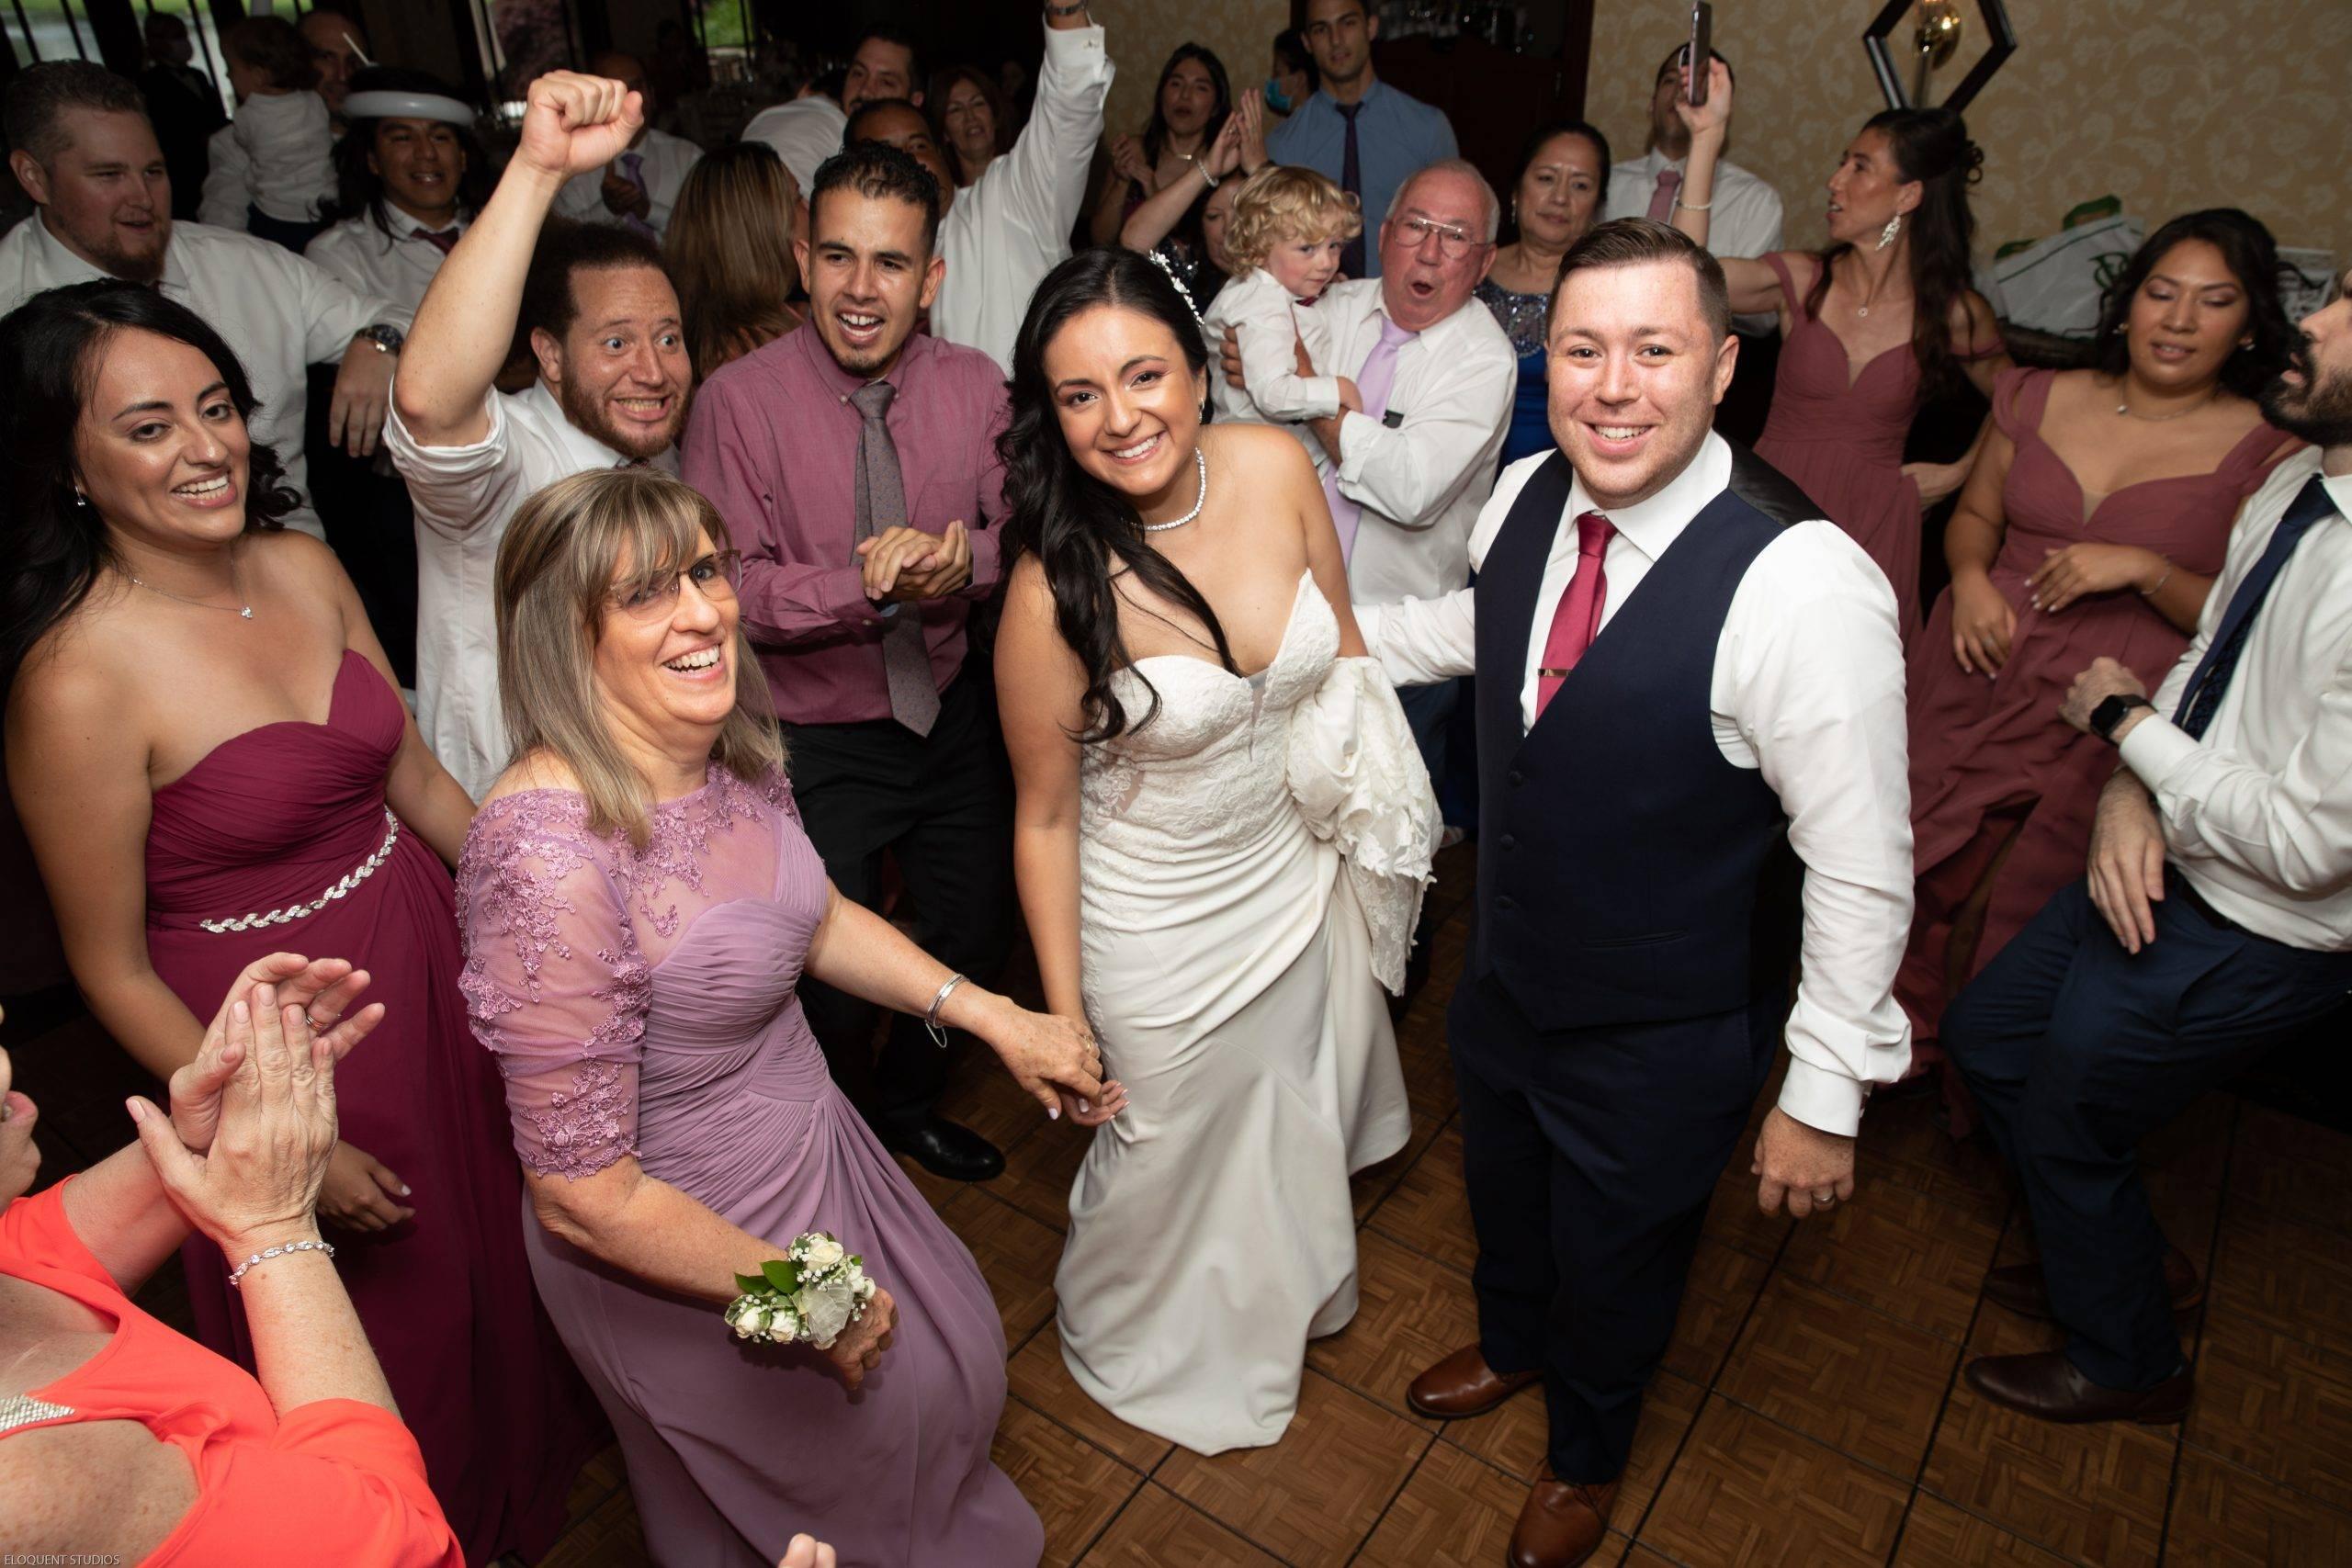 Brooklake bride and groom on dance floor